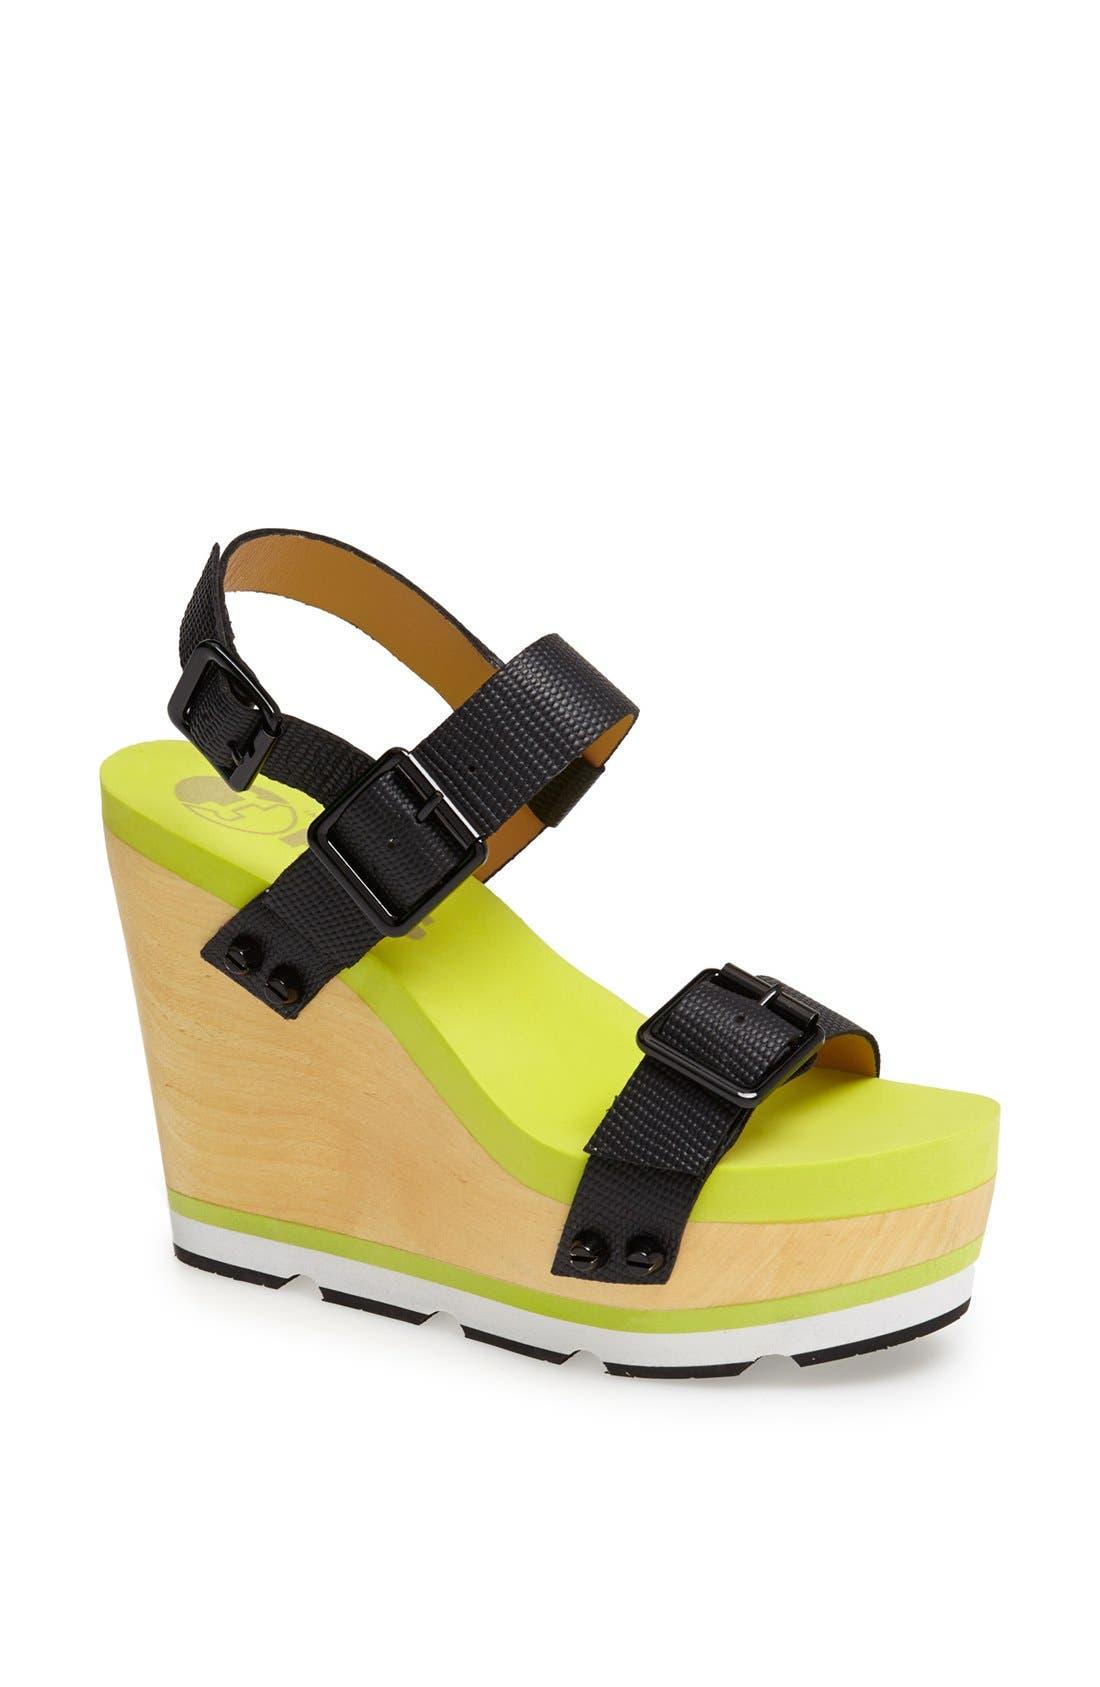 Main Image - Flogg 'Claudia' Wedge Platform Sandal